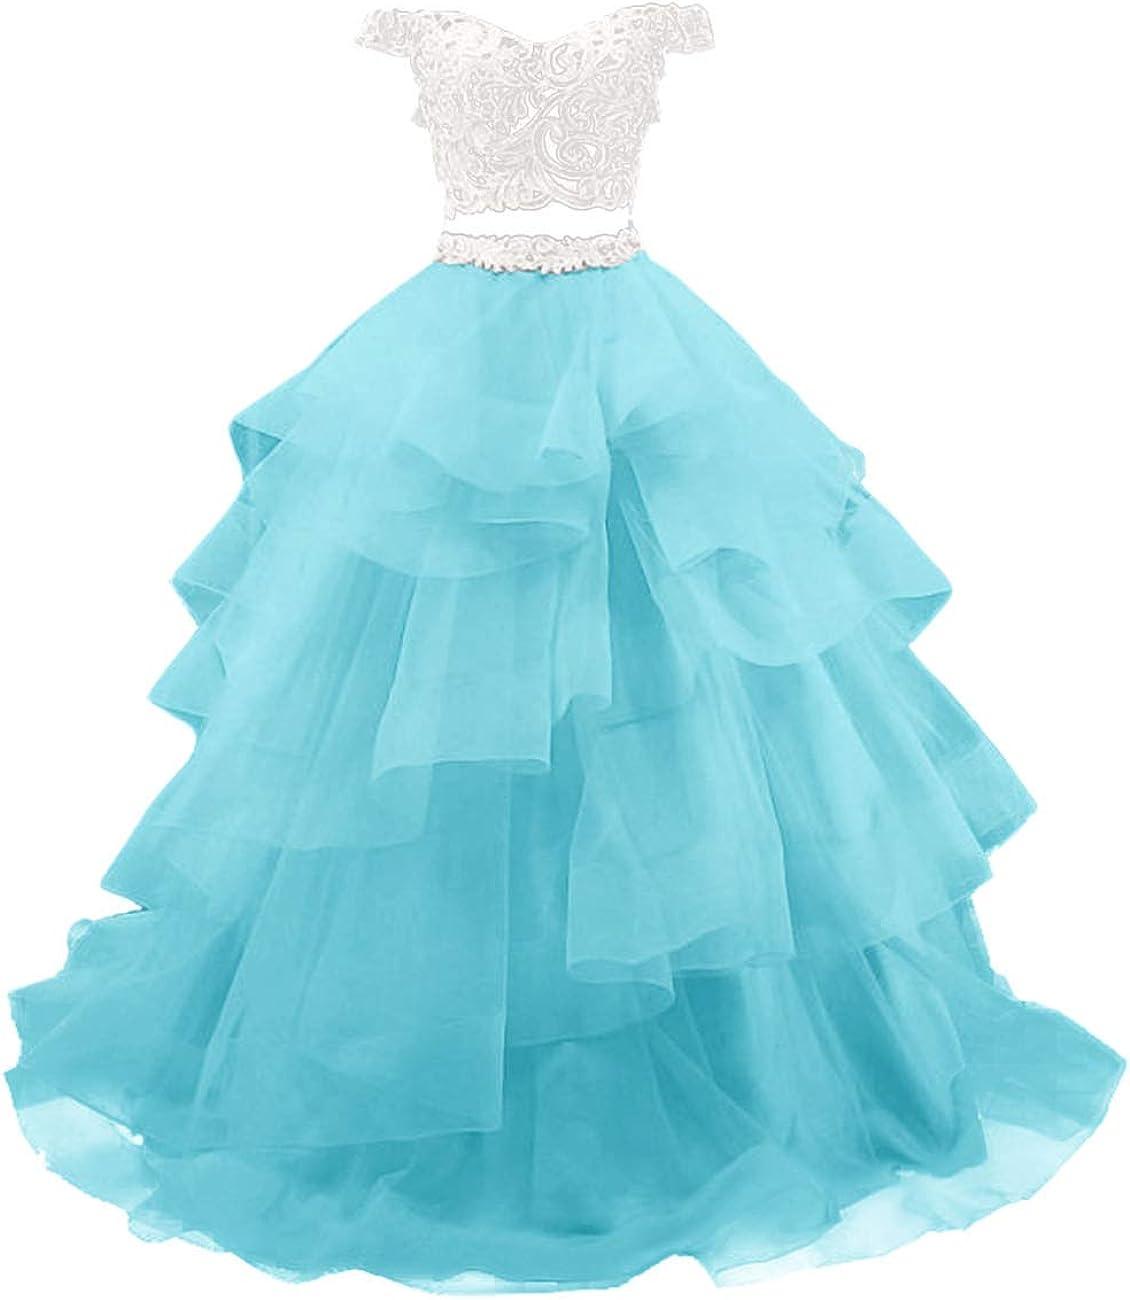 H.S.D Ball Gown Prom Dresses Off 国内即発送 The Qui Dress 16 Sweet 高額売筋 Shoulder